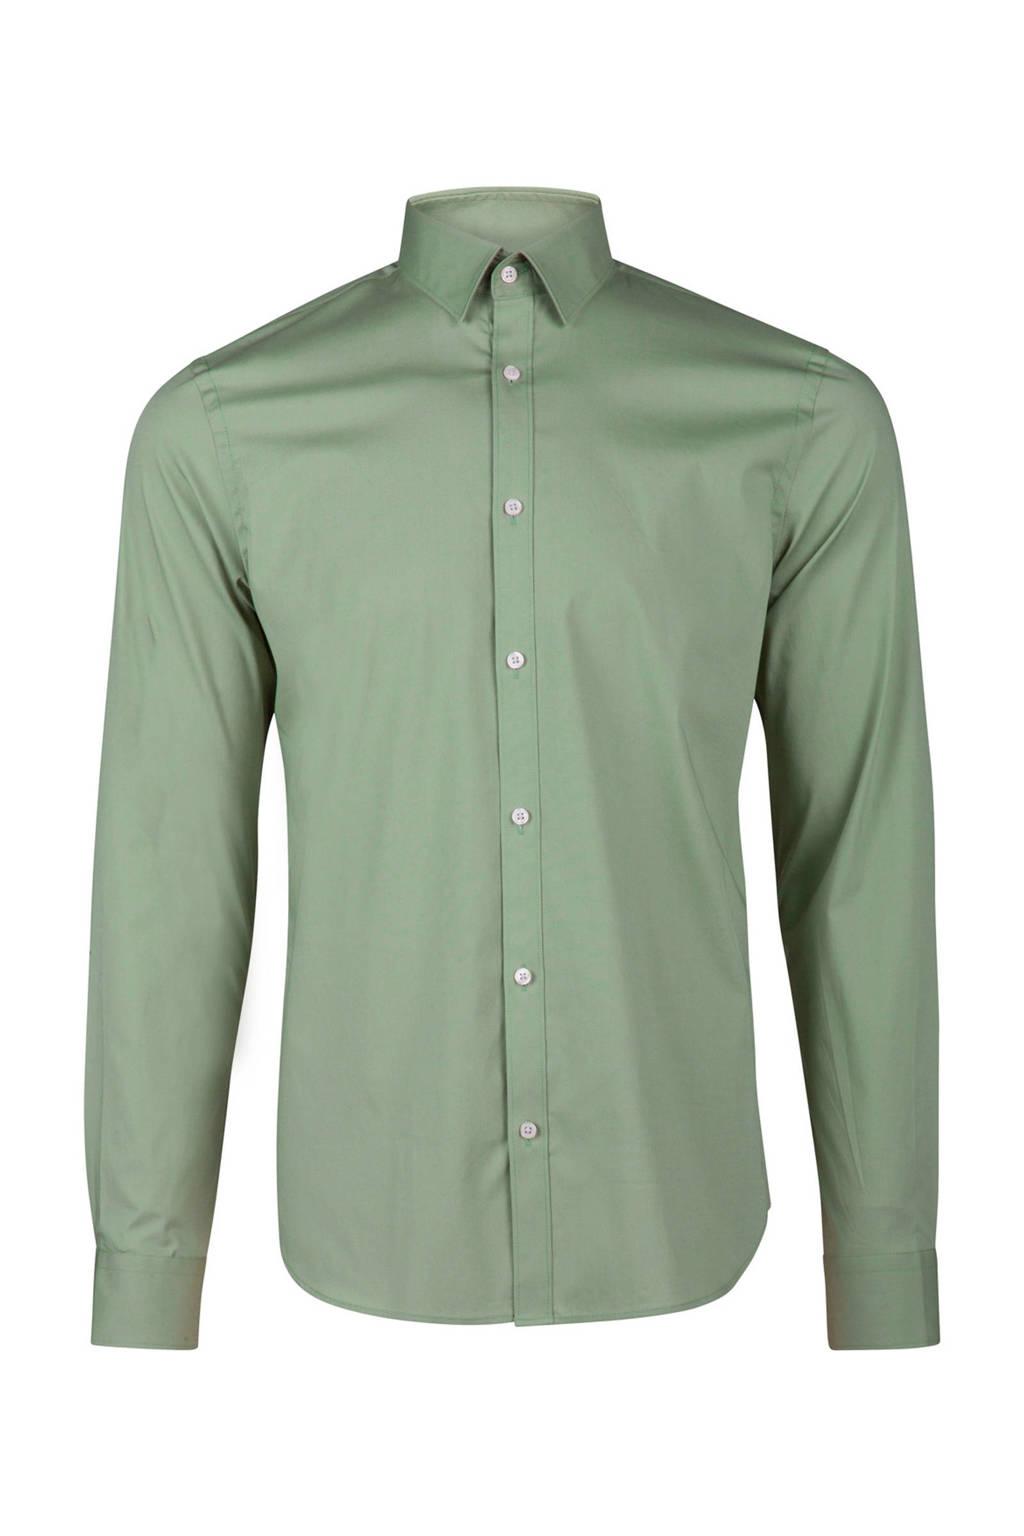 Overhemd Mintgroen.We Fashion Slim Fit Overhemd Wehkamp